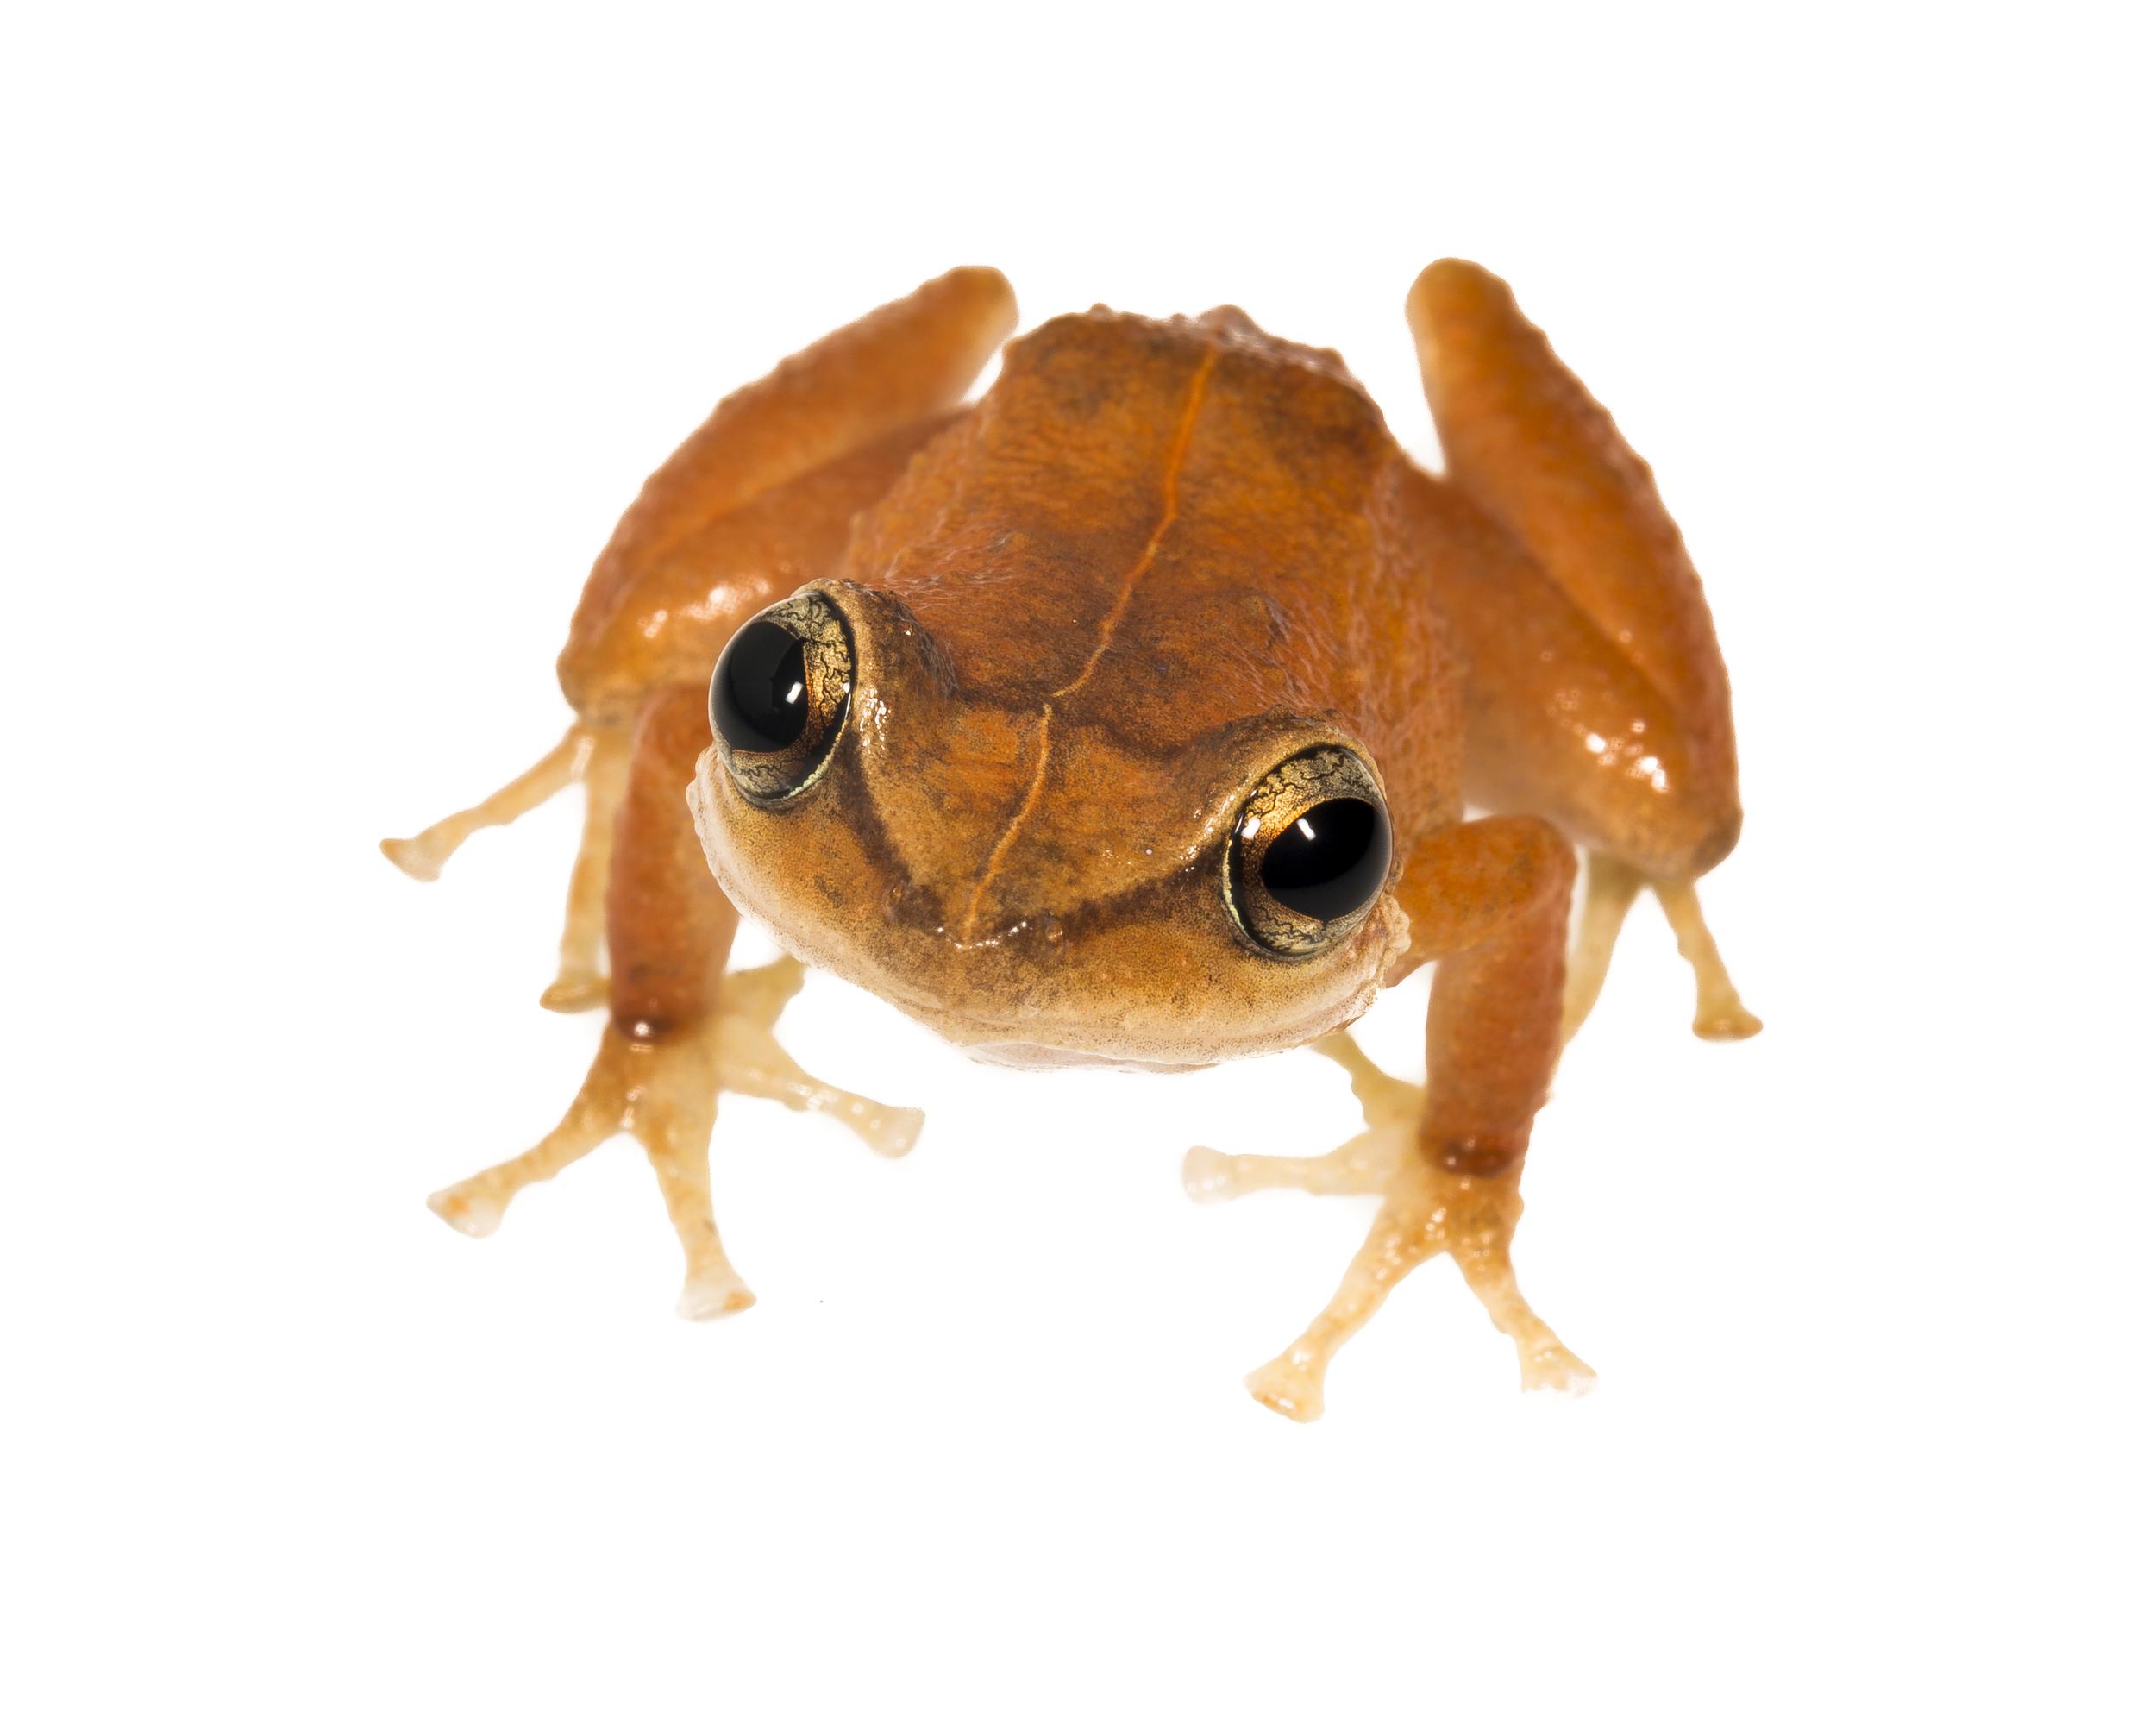 Coqui Frog - Eleutherodactylus cqui